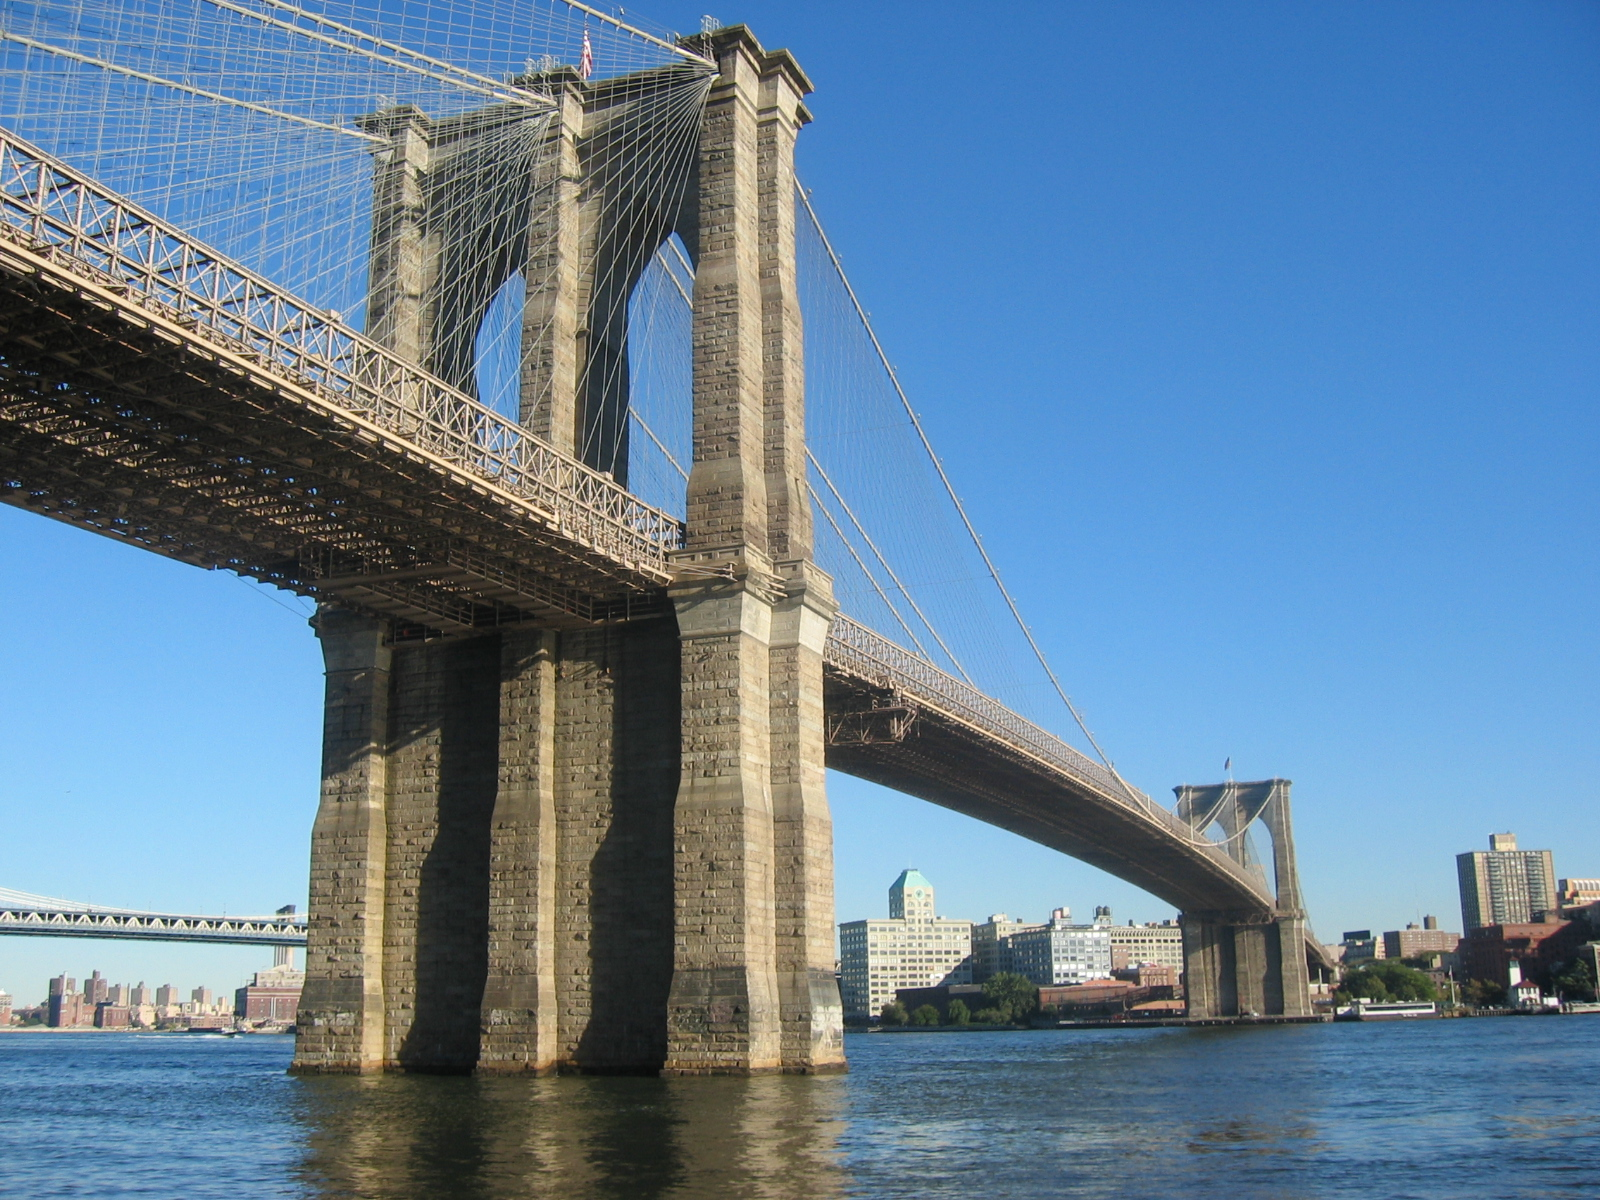 new york city tourist attractions tourist destinations. Black Bedroom Furniture Sets. Home Design Ideas